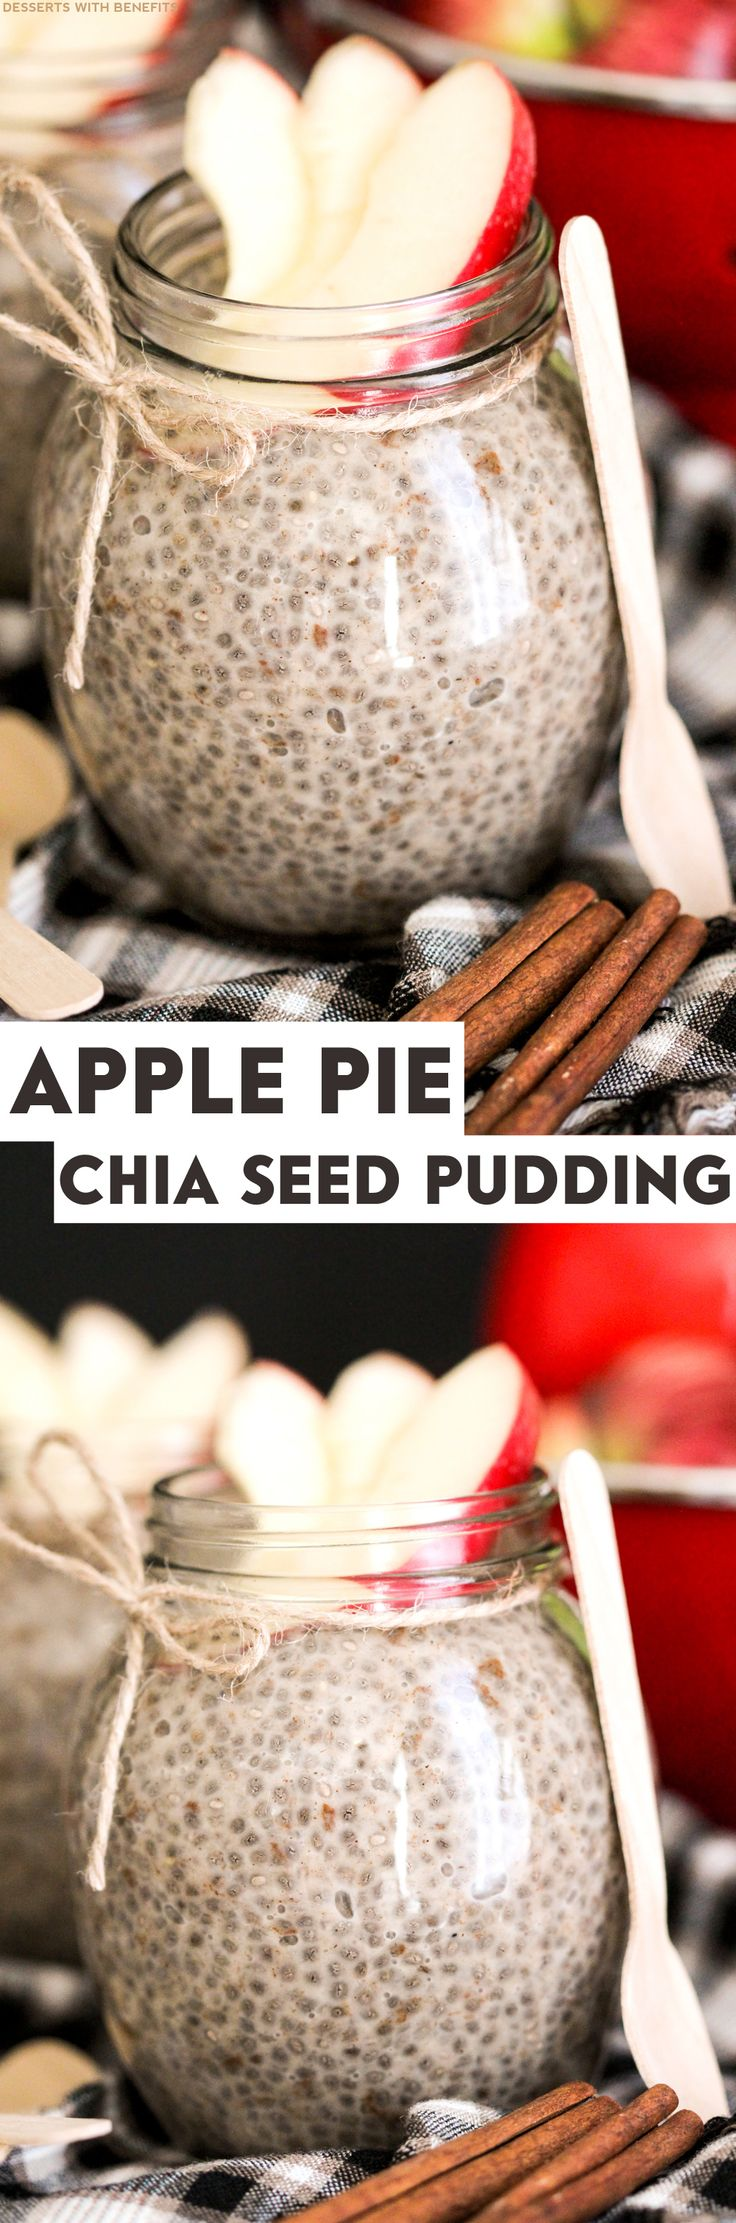 Best 25 Healthy Packaged Snacks Ideas On Pinterest Healthy Dorm Snacks Healthy Snacks For